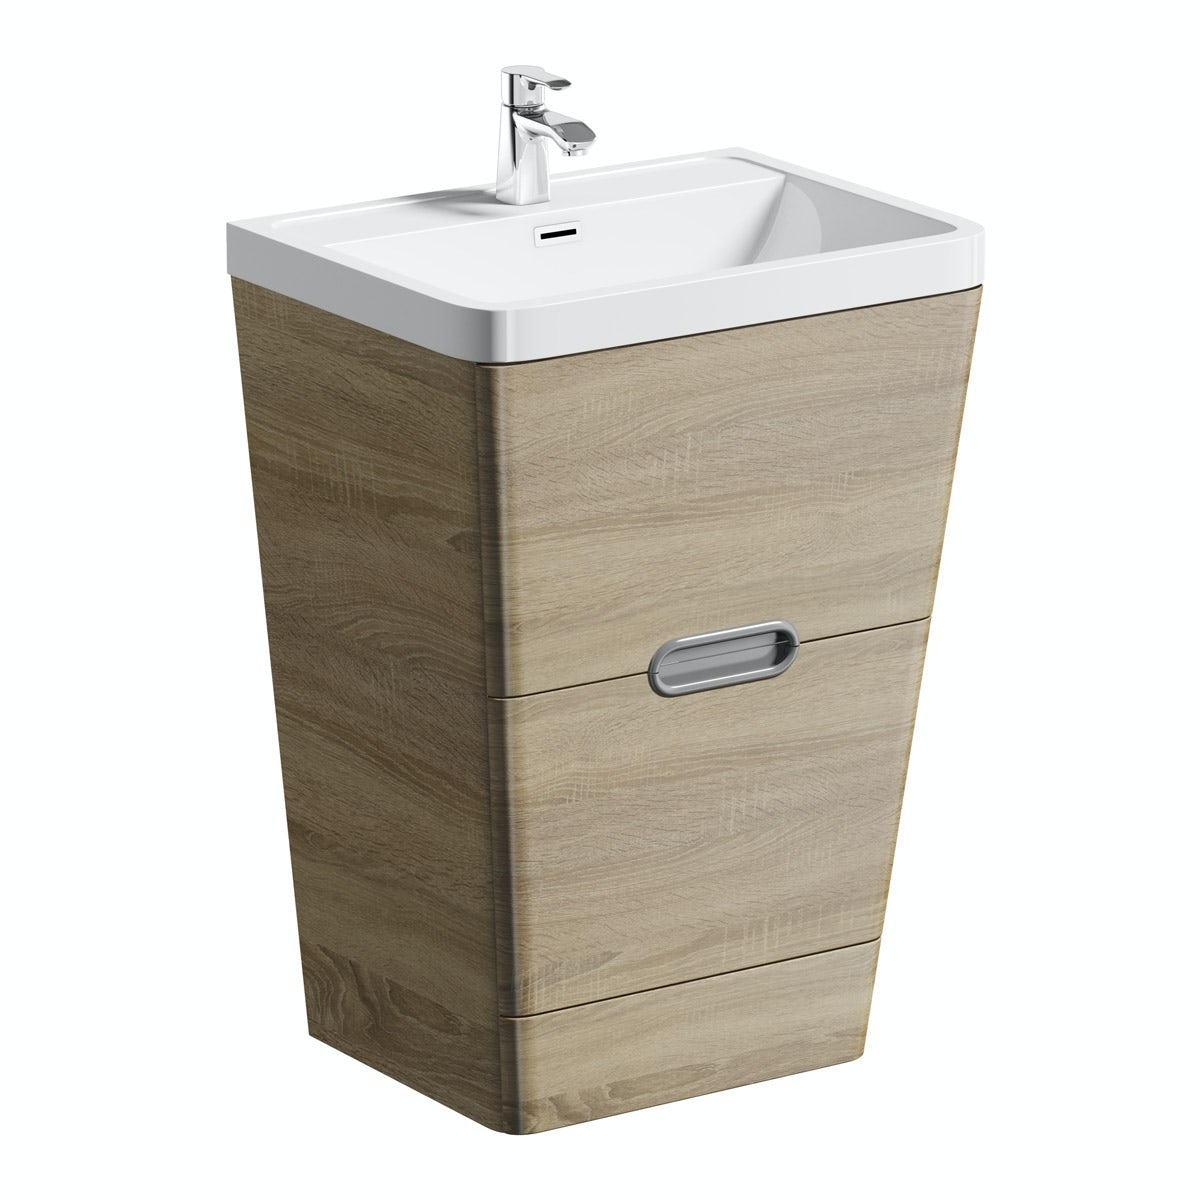 Mode Sherwood oak floor standing vanity unit and resin basin 600mm